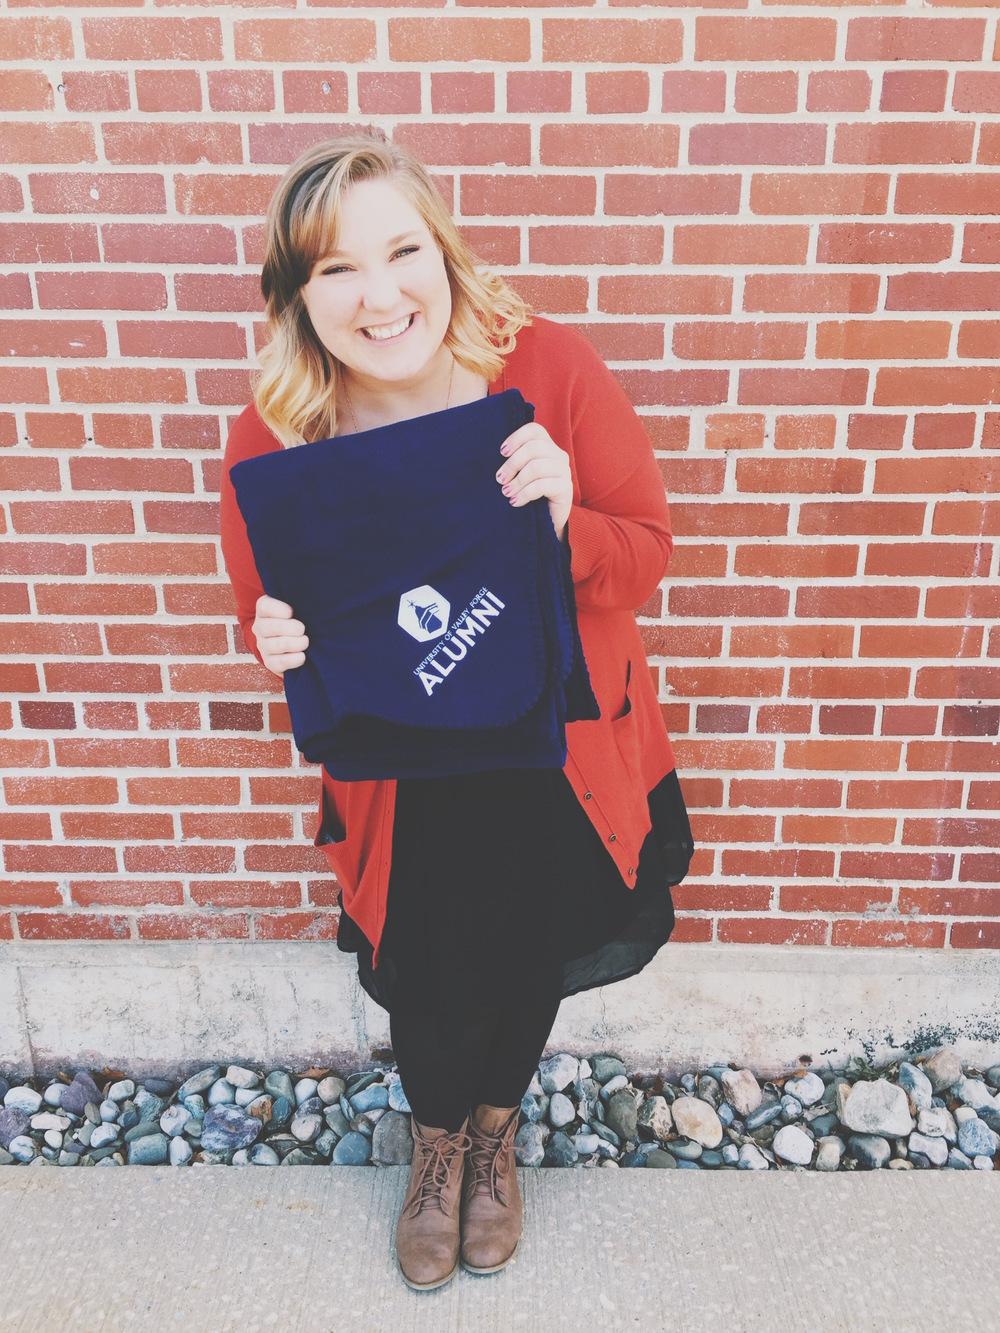 Graduation. University. University of Valley Forge. UVF. Senior. Blanket. Fall Wardrobe.